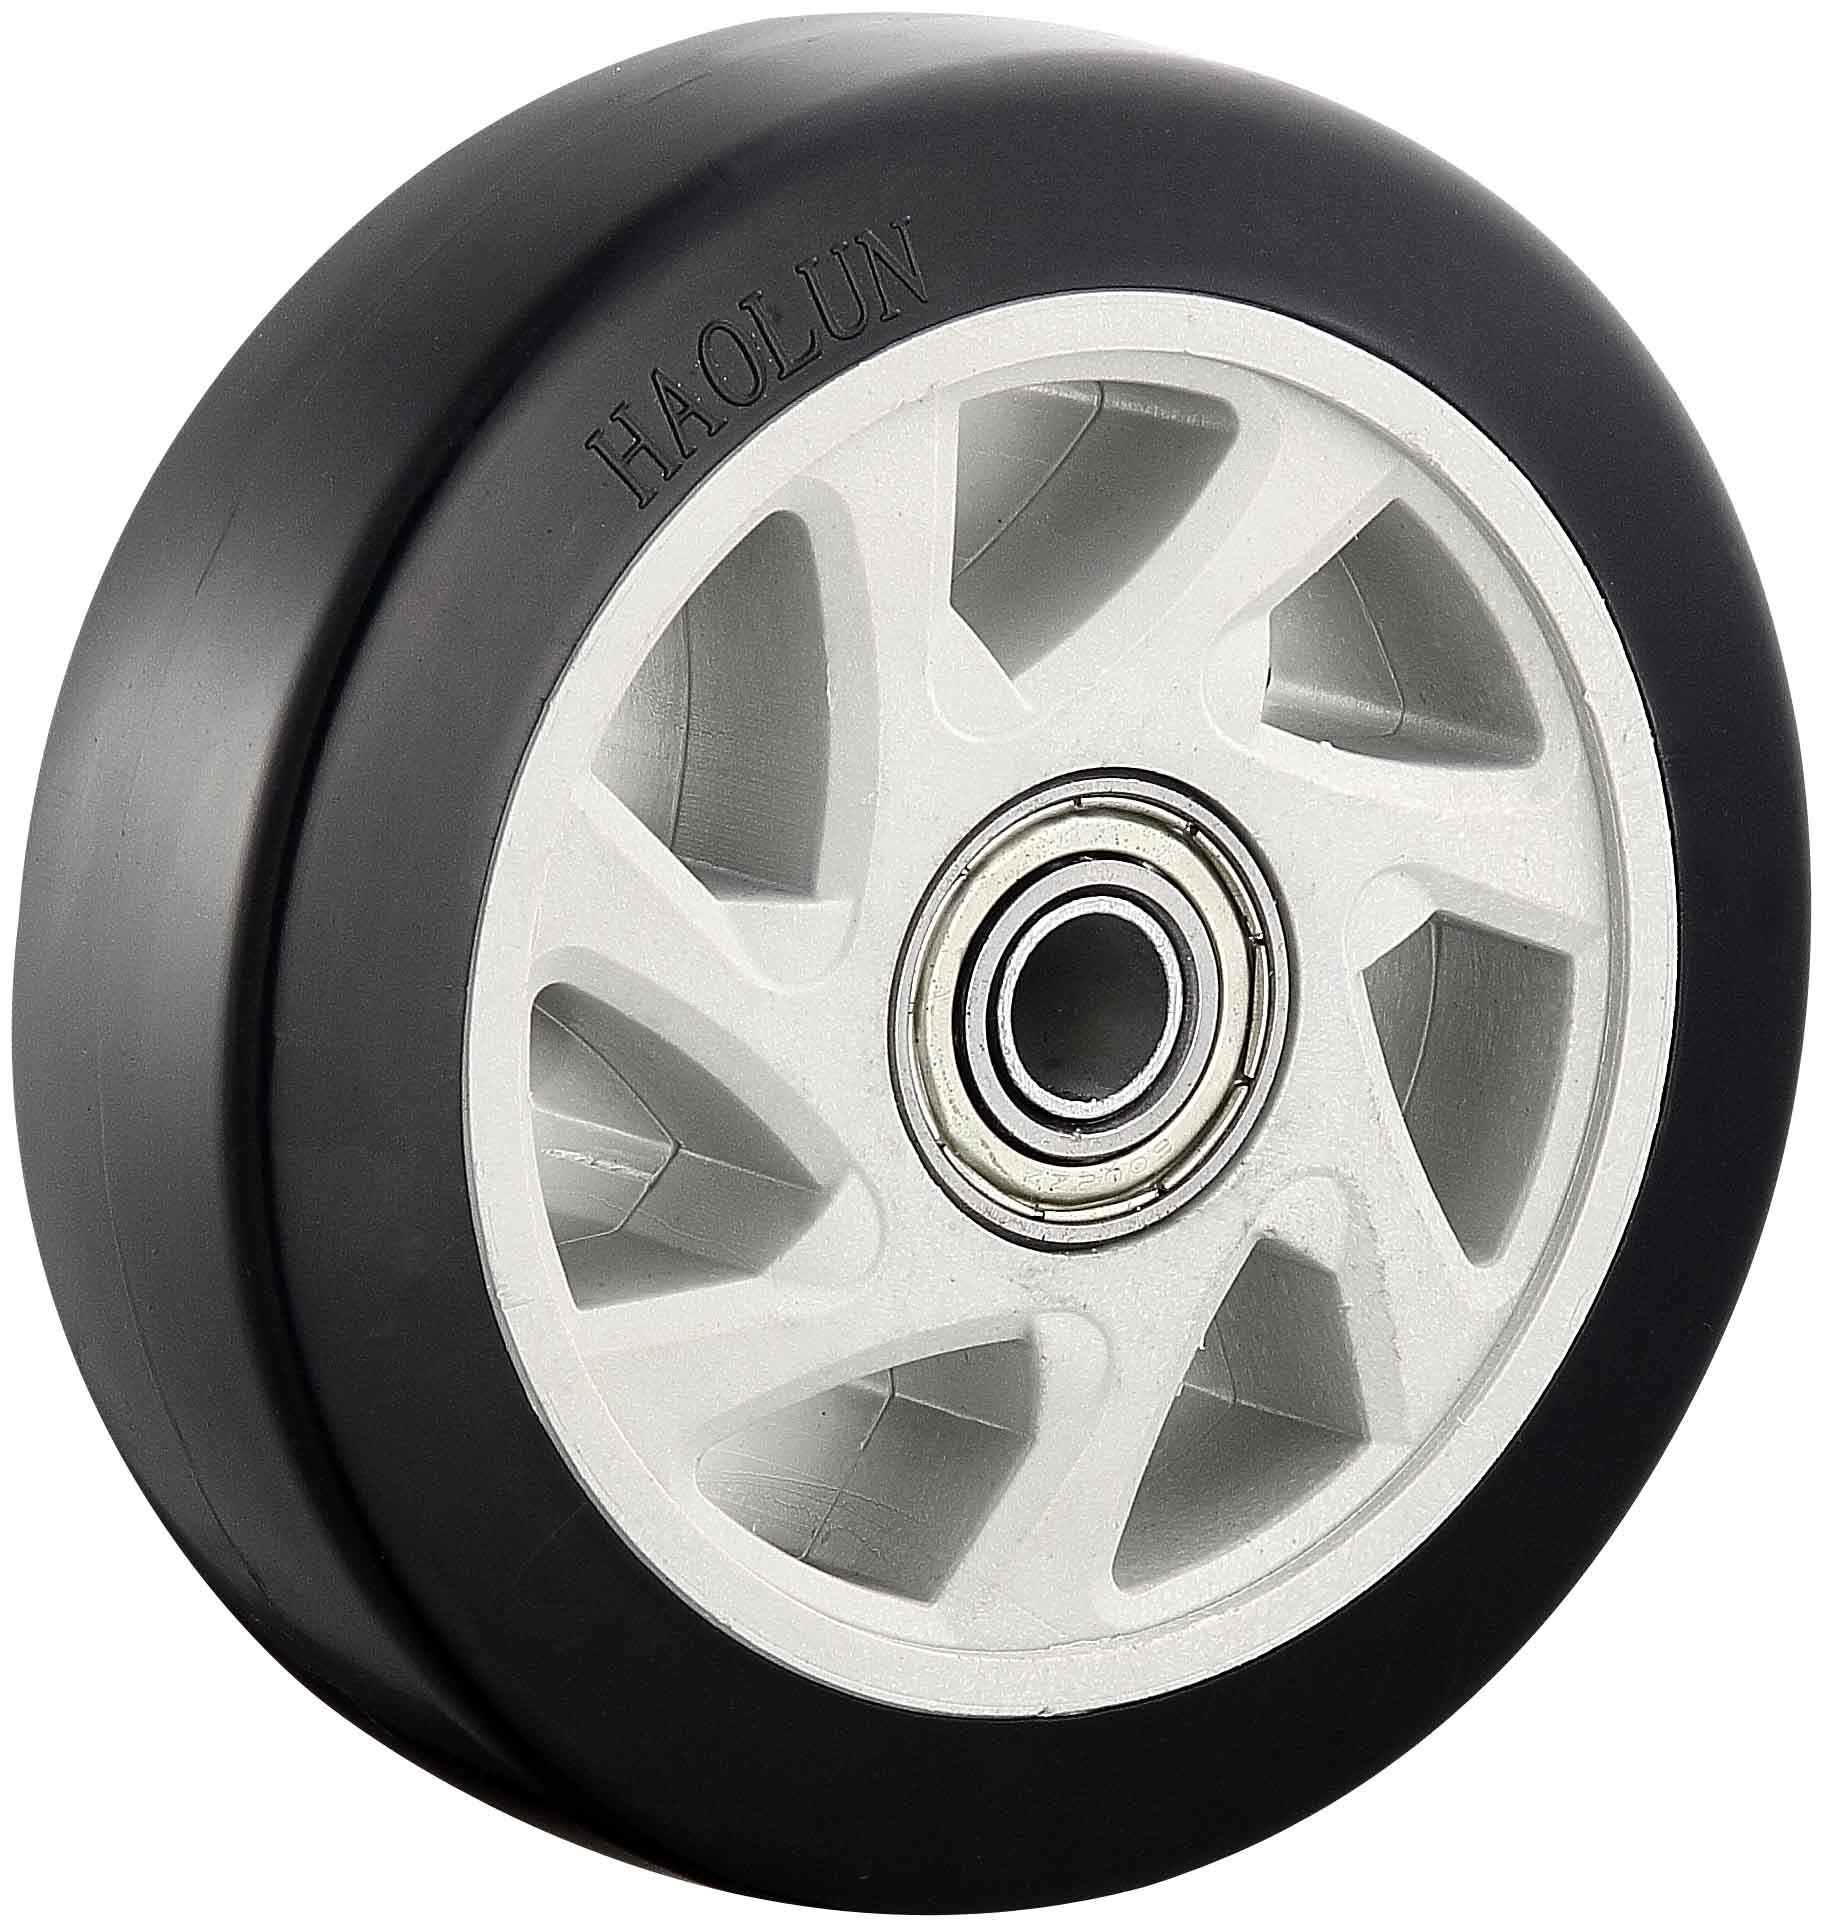 "4′′/5"" Medium Heavy PVC Caster Wheels for Hand Trolley Swivel/Fixed/Brake"